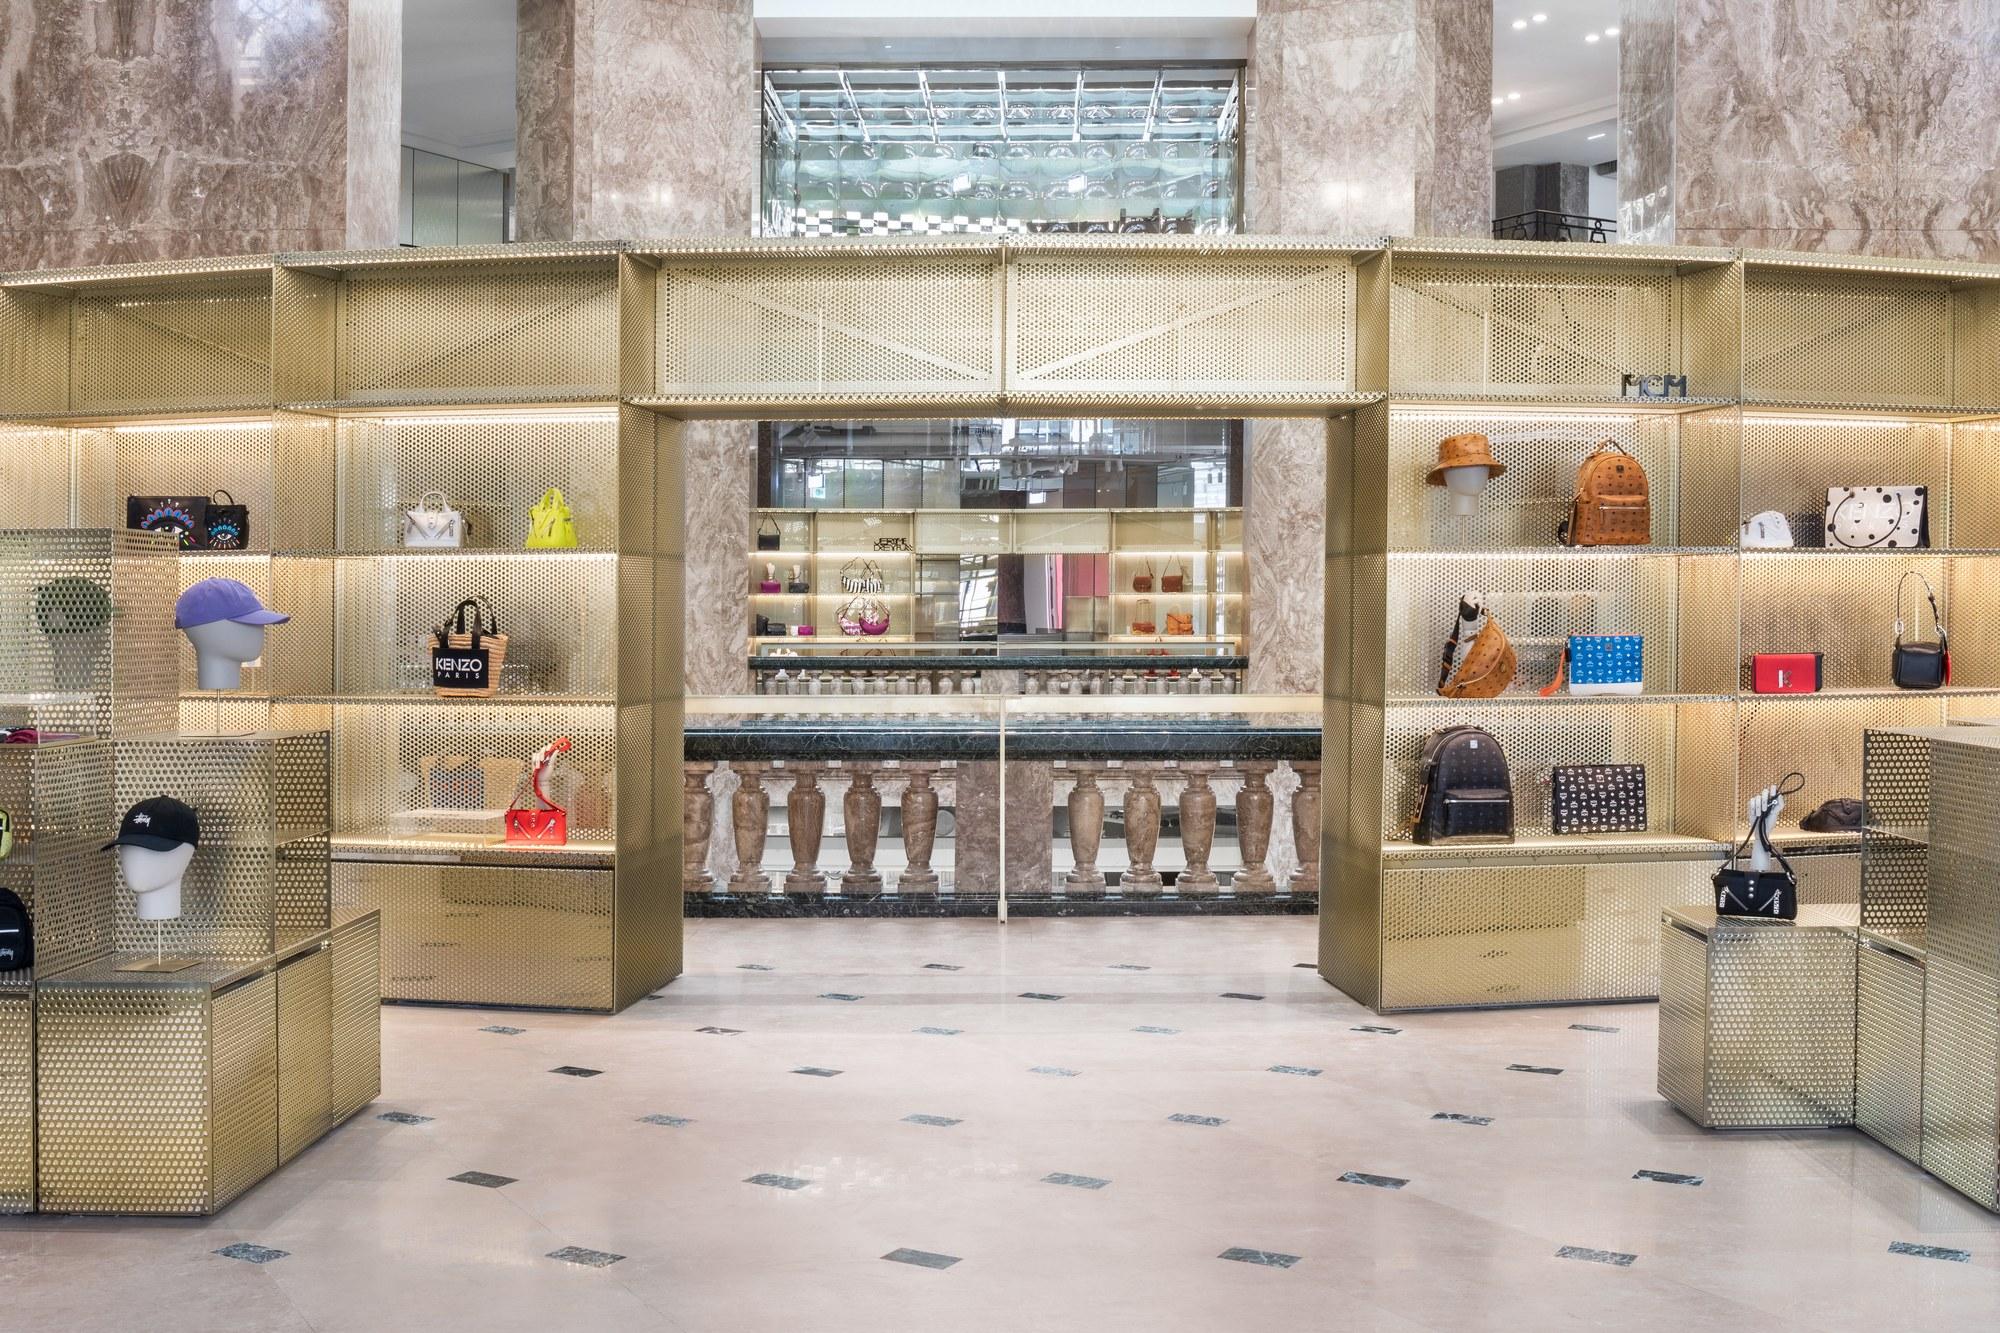 https://i.ibb.co/7W2jPds/Galeries-Lafayette-Champs-Elys-es-Maroquinerie-mars-2019-c-Delfino-Sisto-Legnani-e-Marco-Cappelletti.jpg